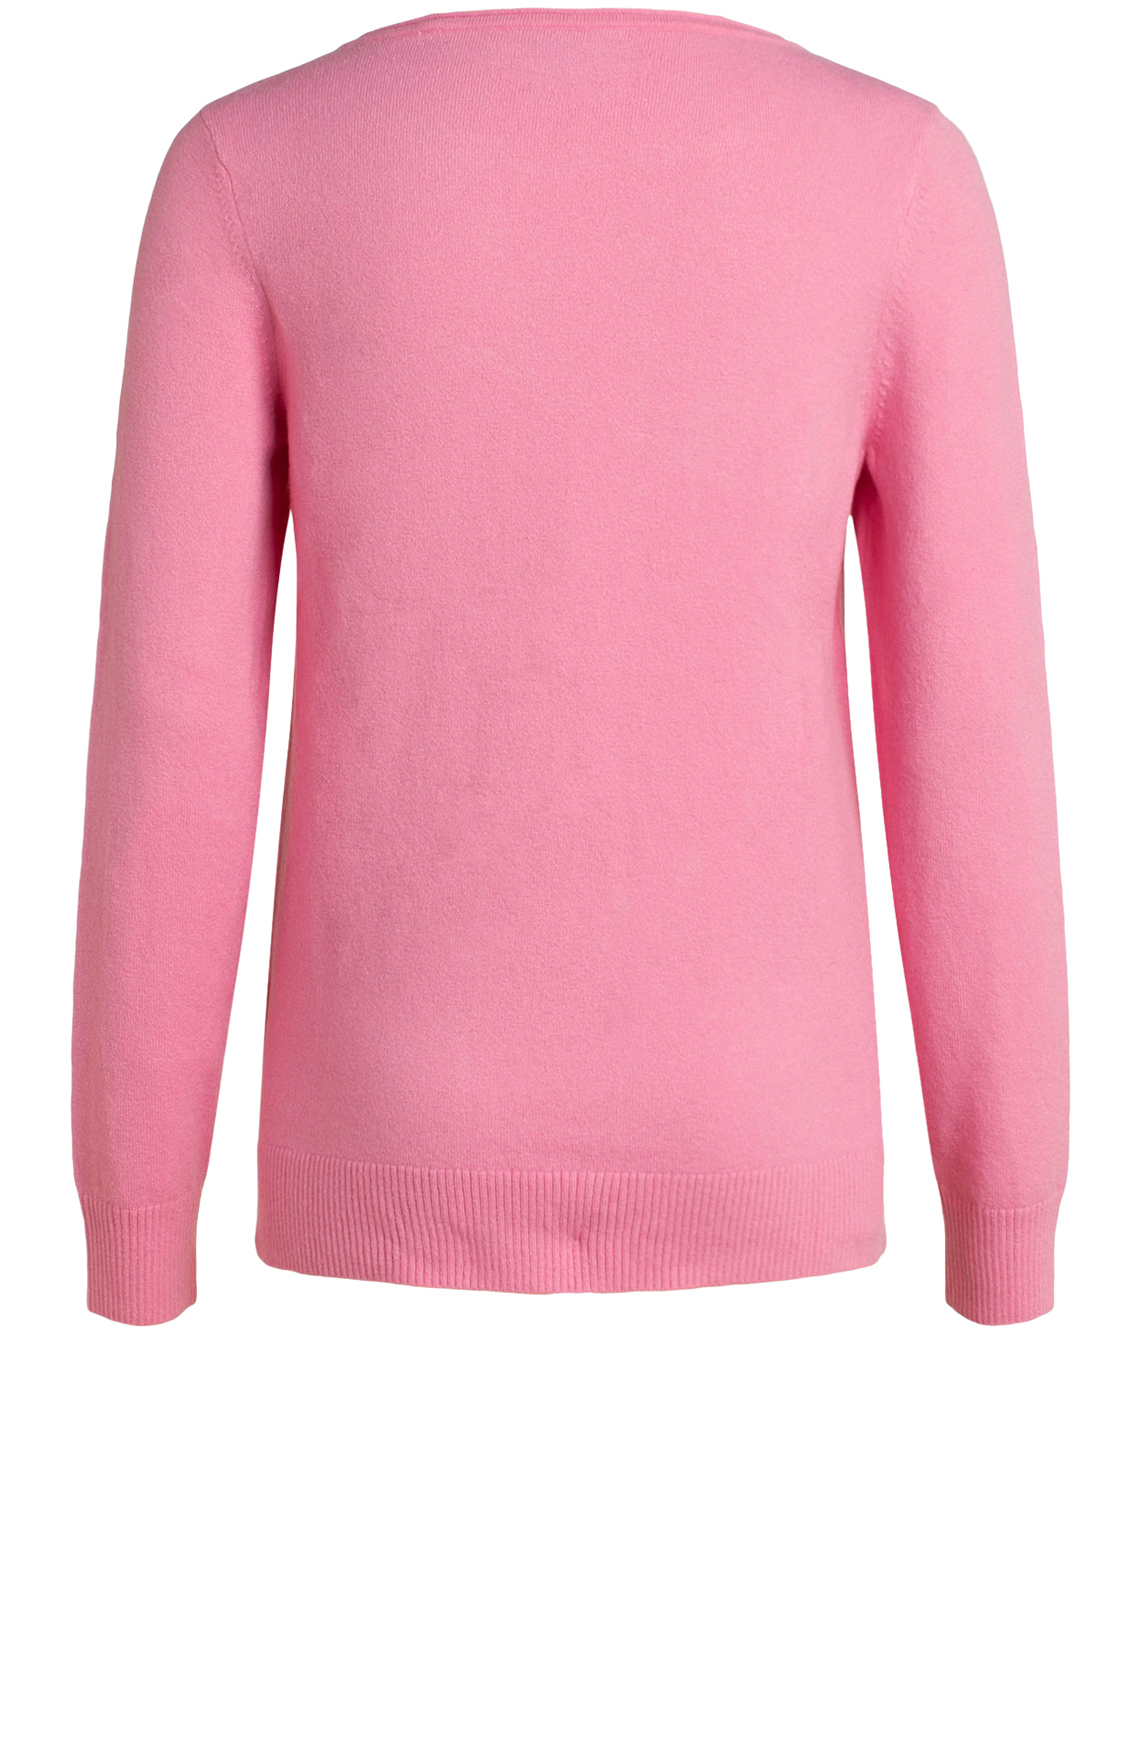 Marc O'Polo Dames Gebreide pullover roze